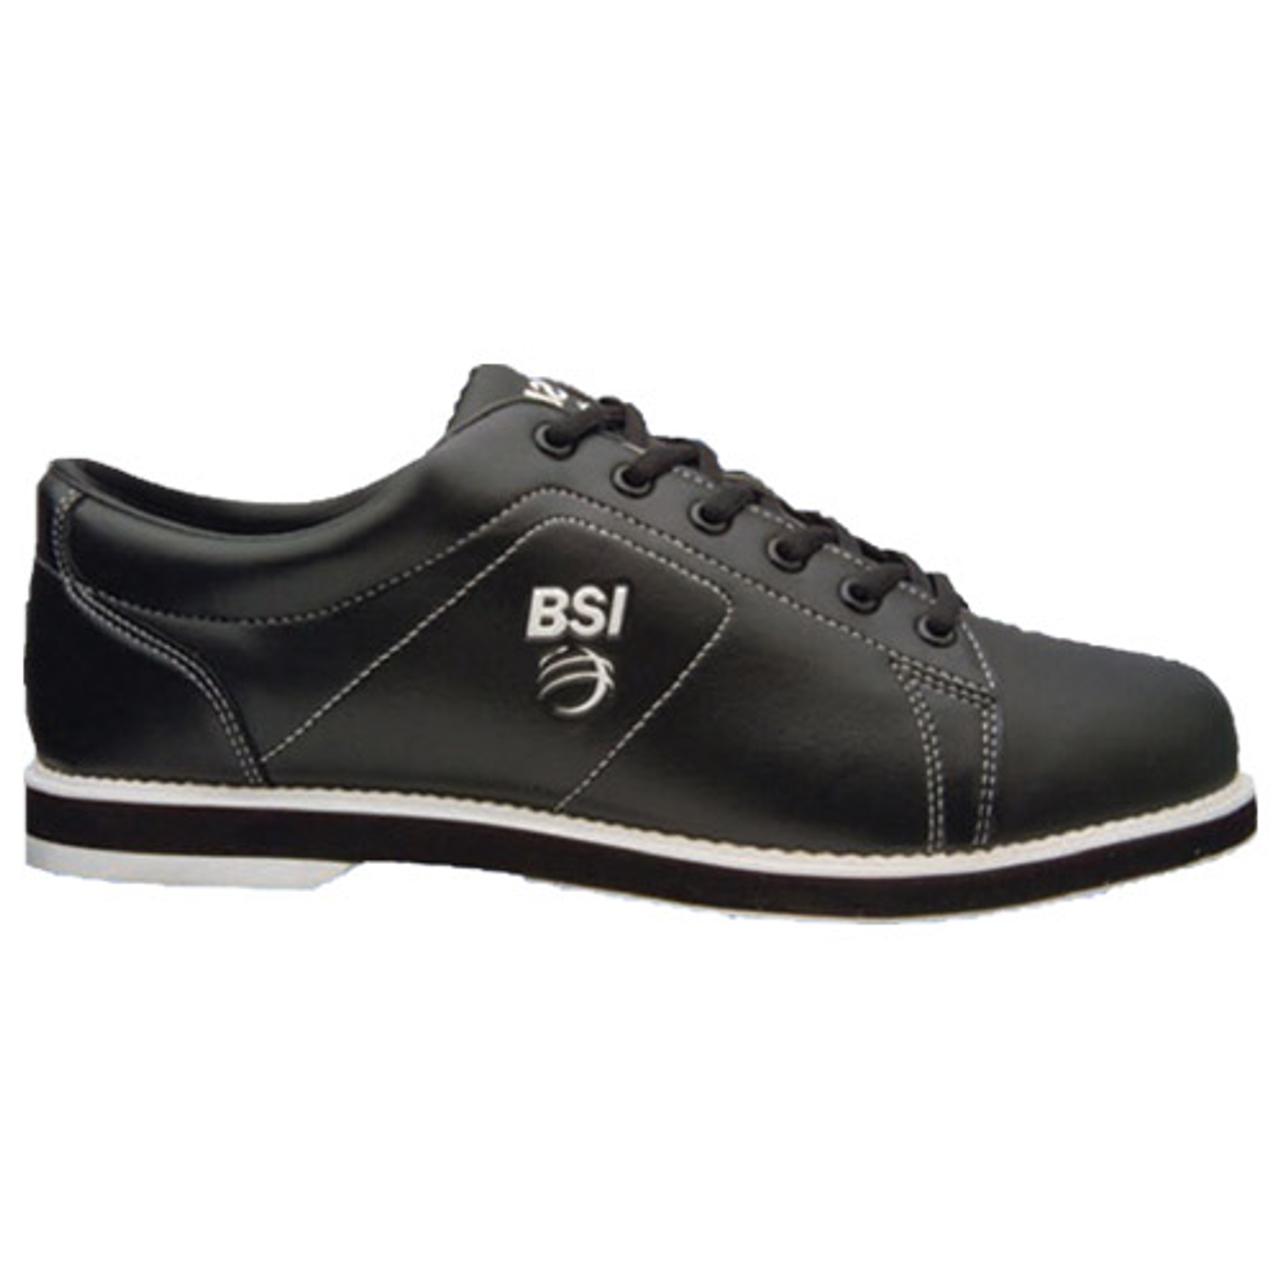 BSI Mens Classic Bowling Shoes Black